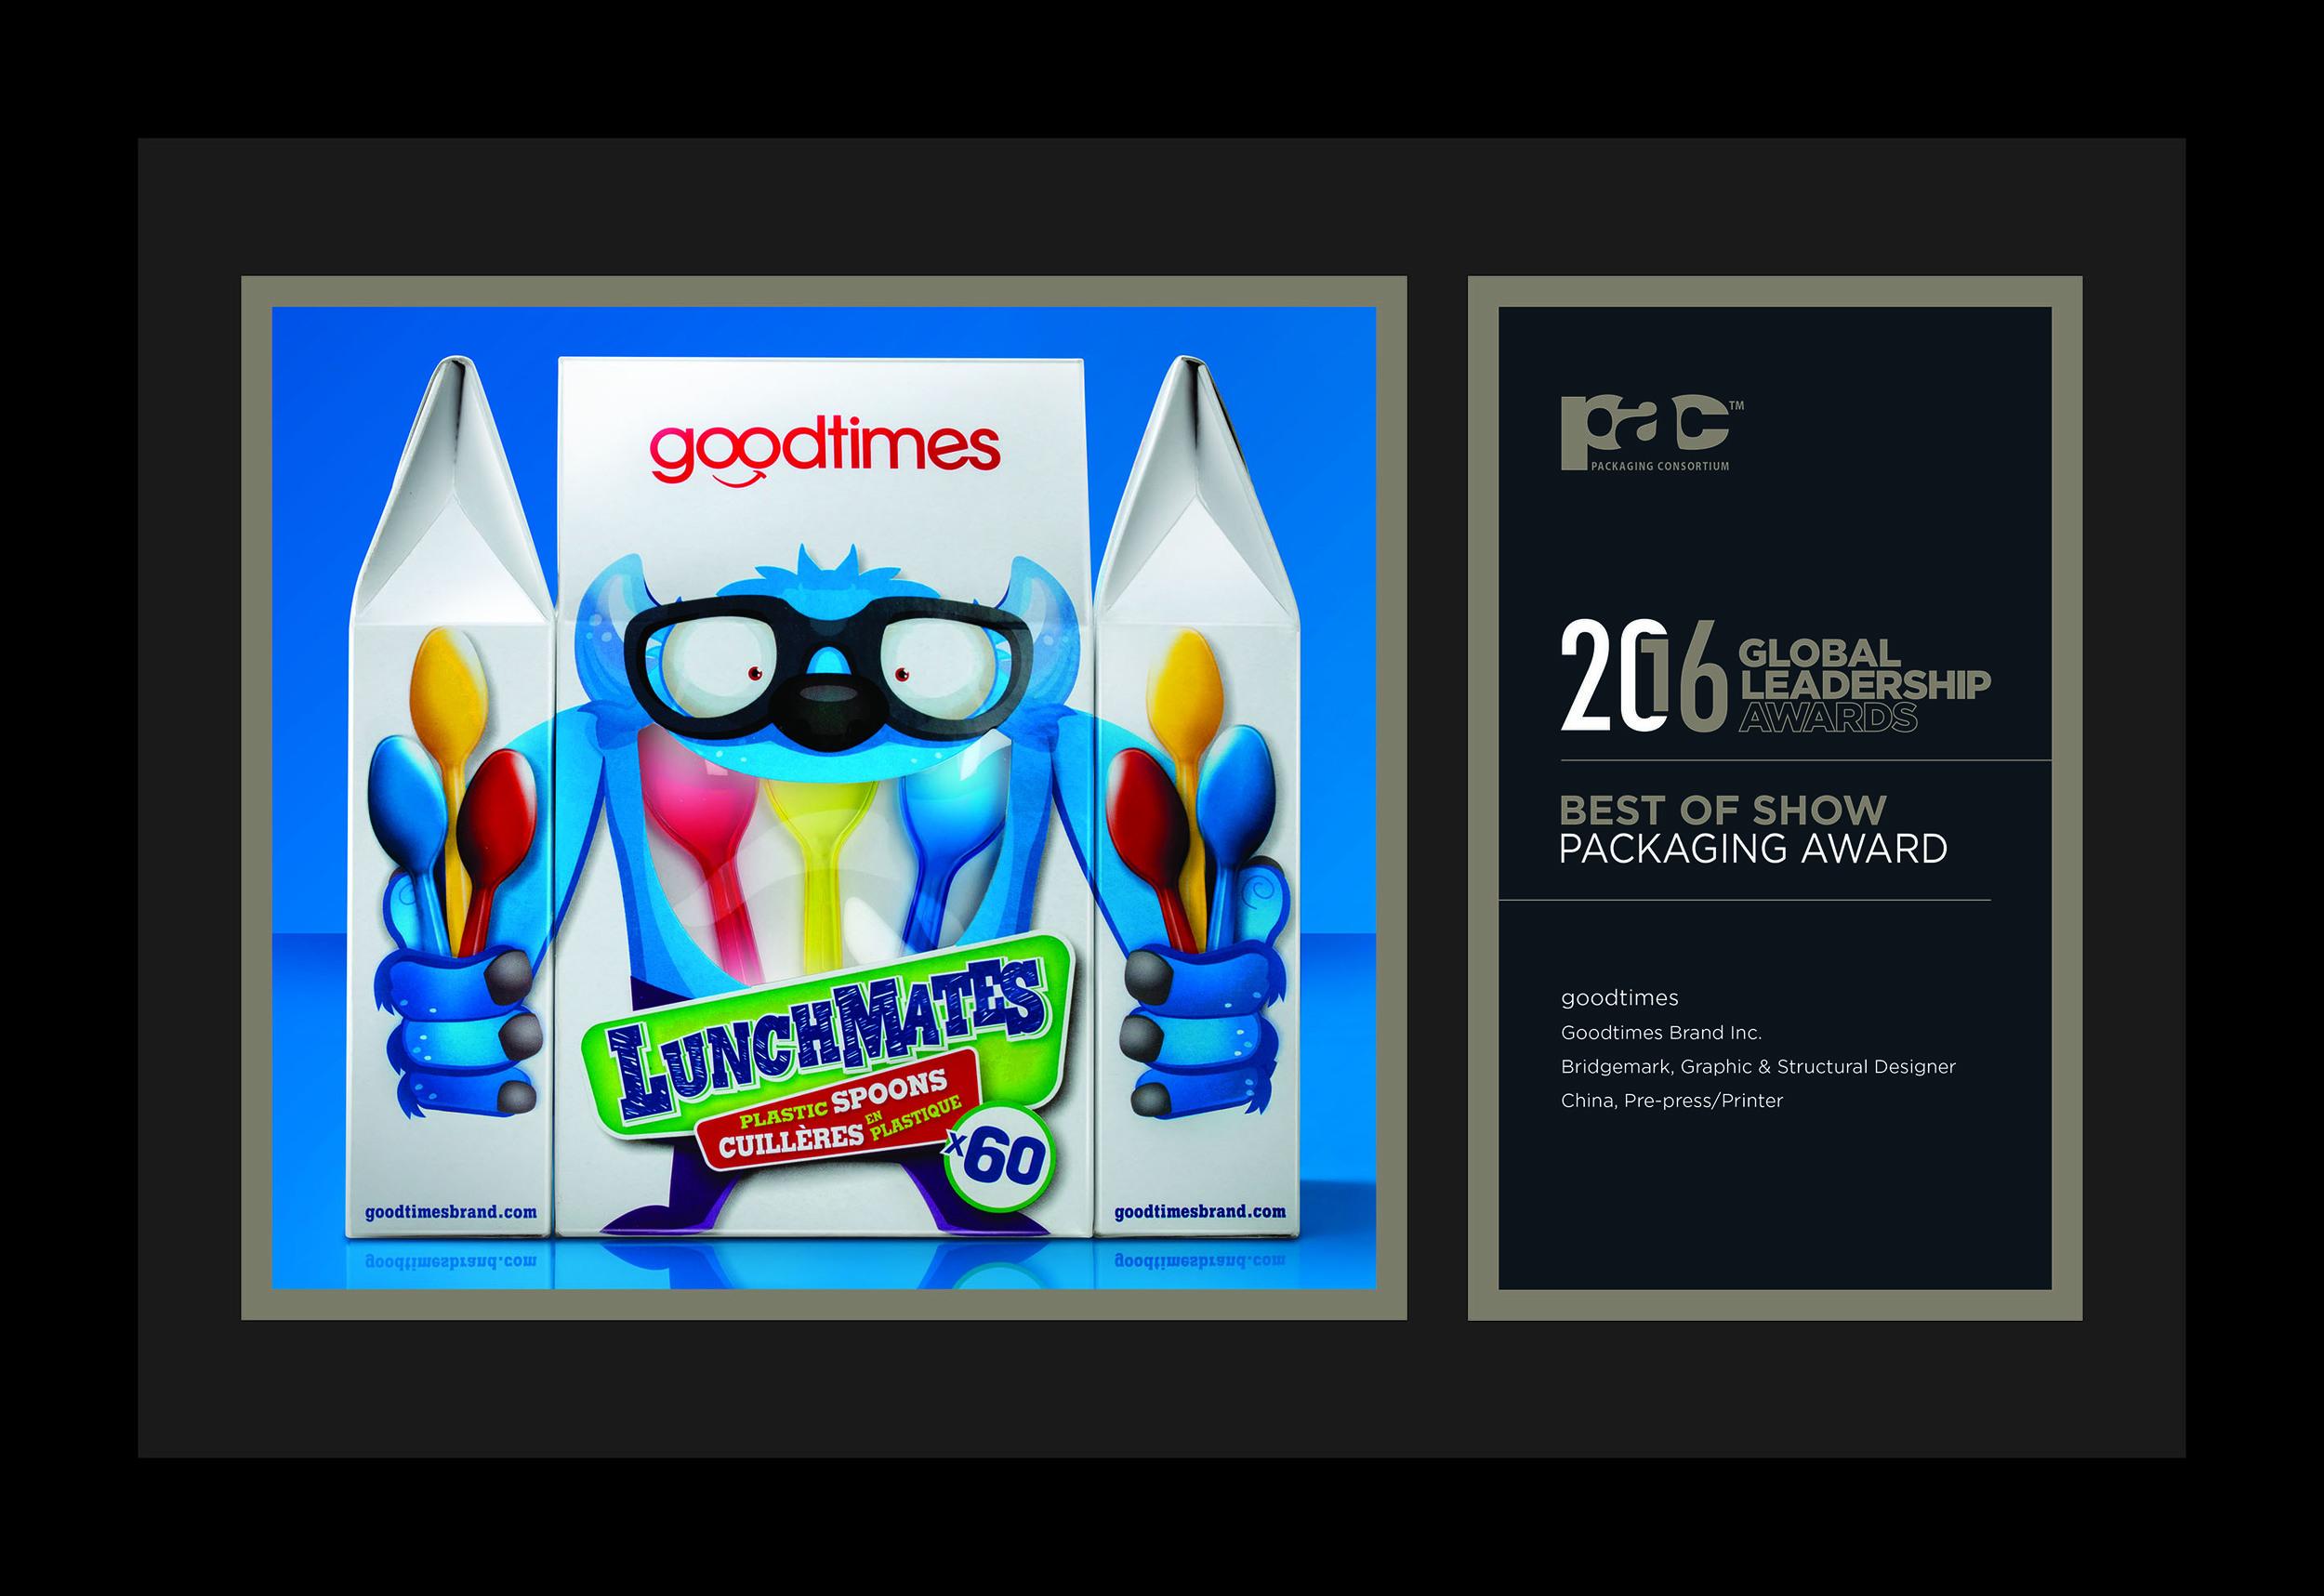 Goodtimes-Bridgemark.jpg